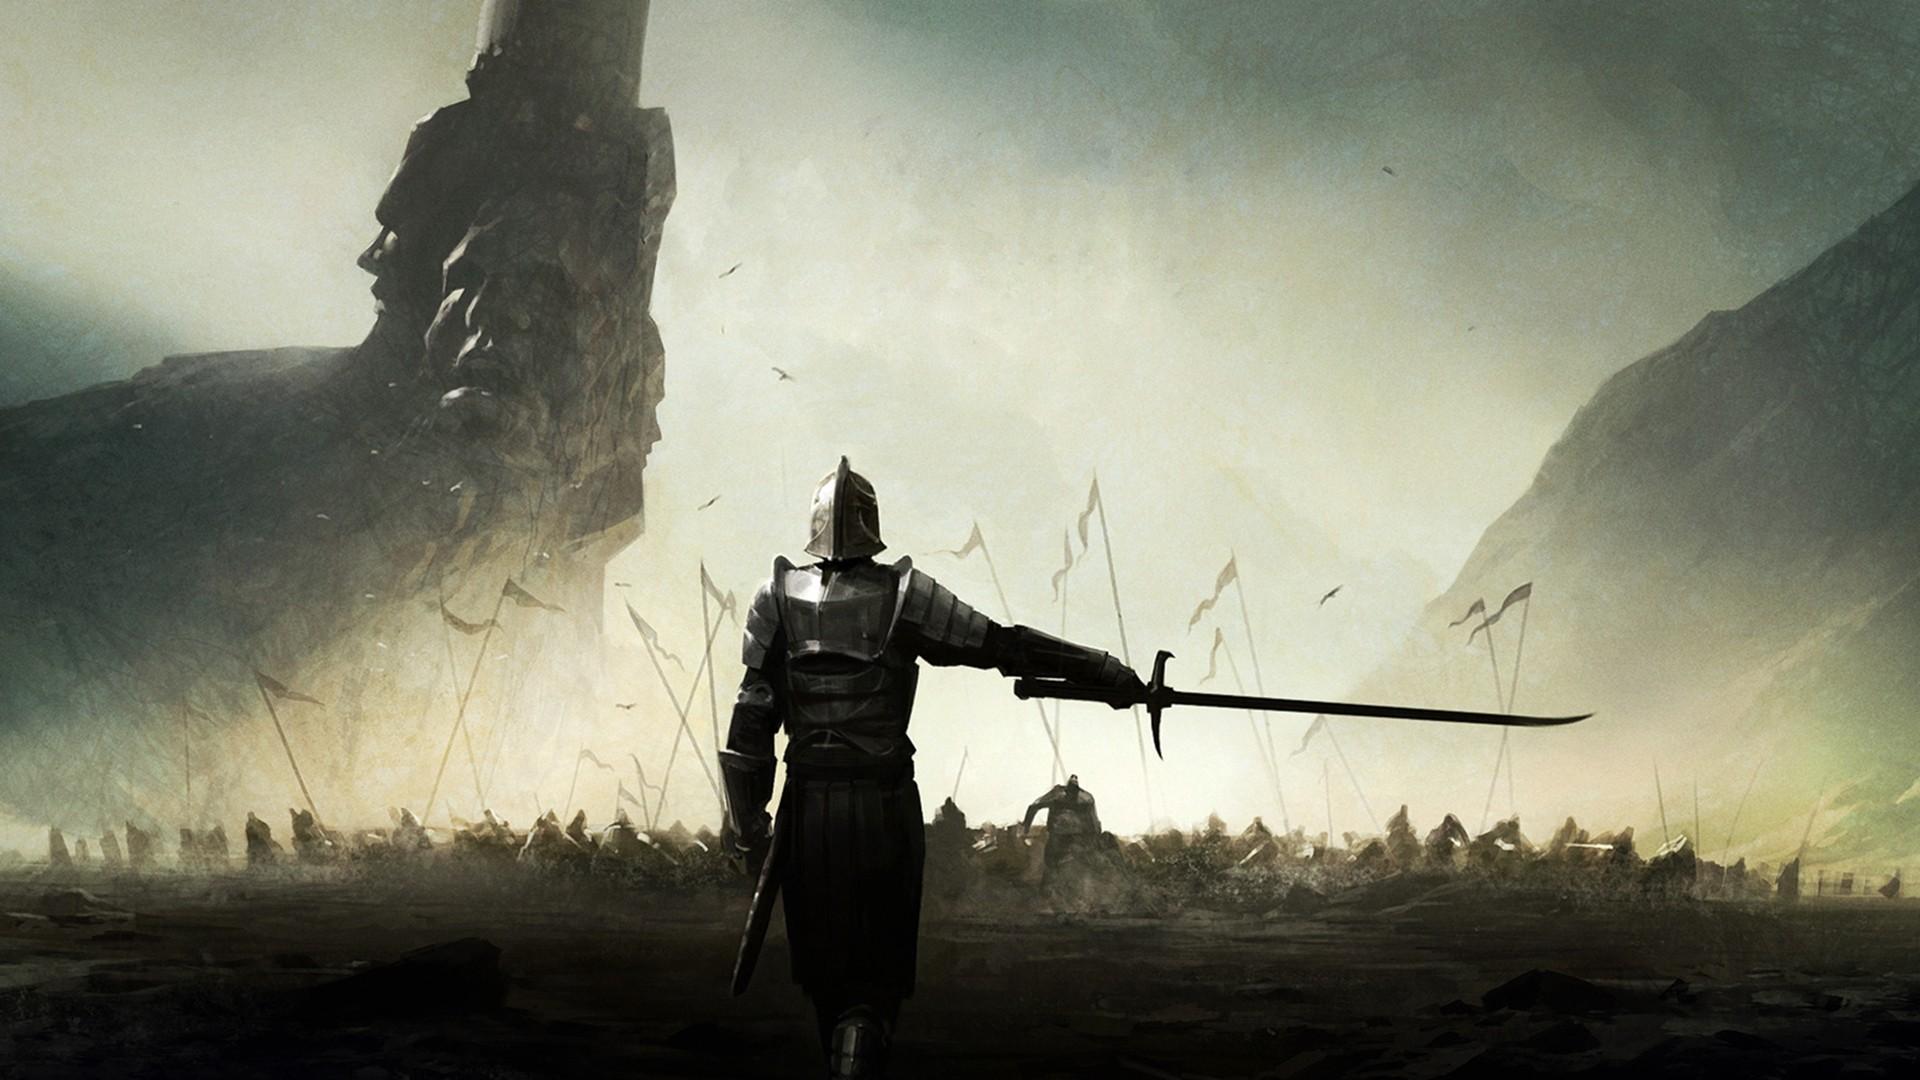 Medieval Mortal Online Sword Knight wallpaper backgroundMedieval Archery Wallpaper